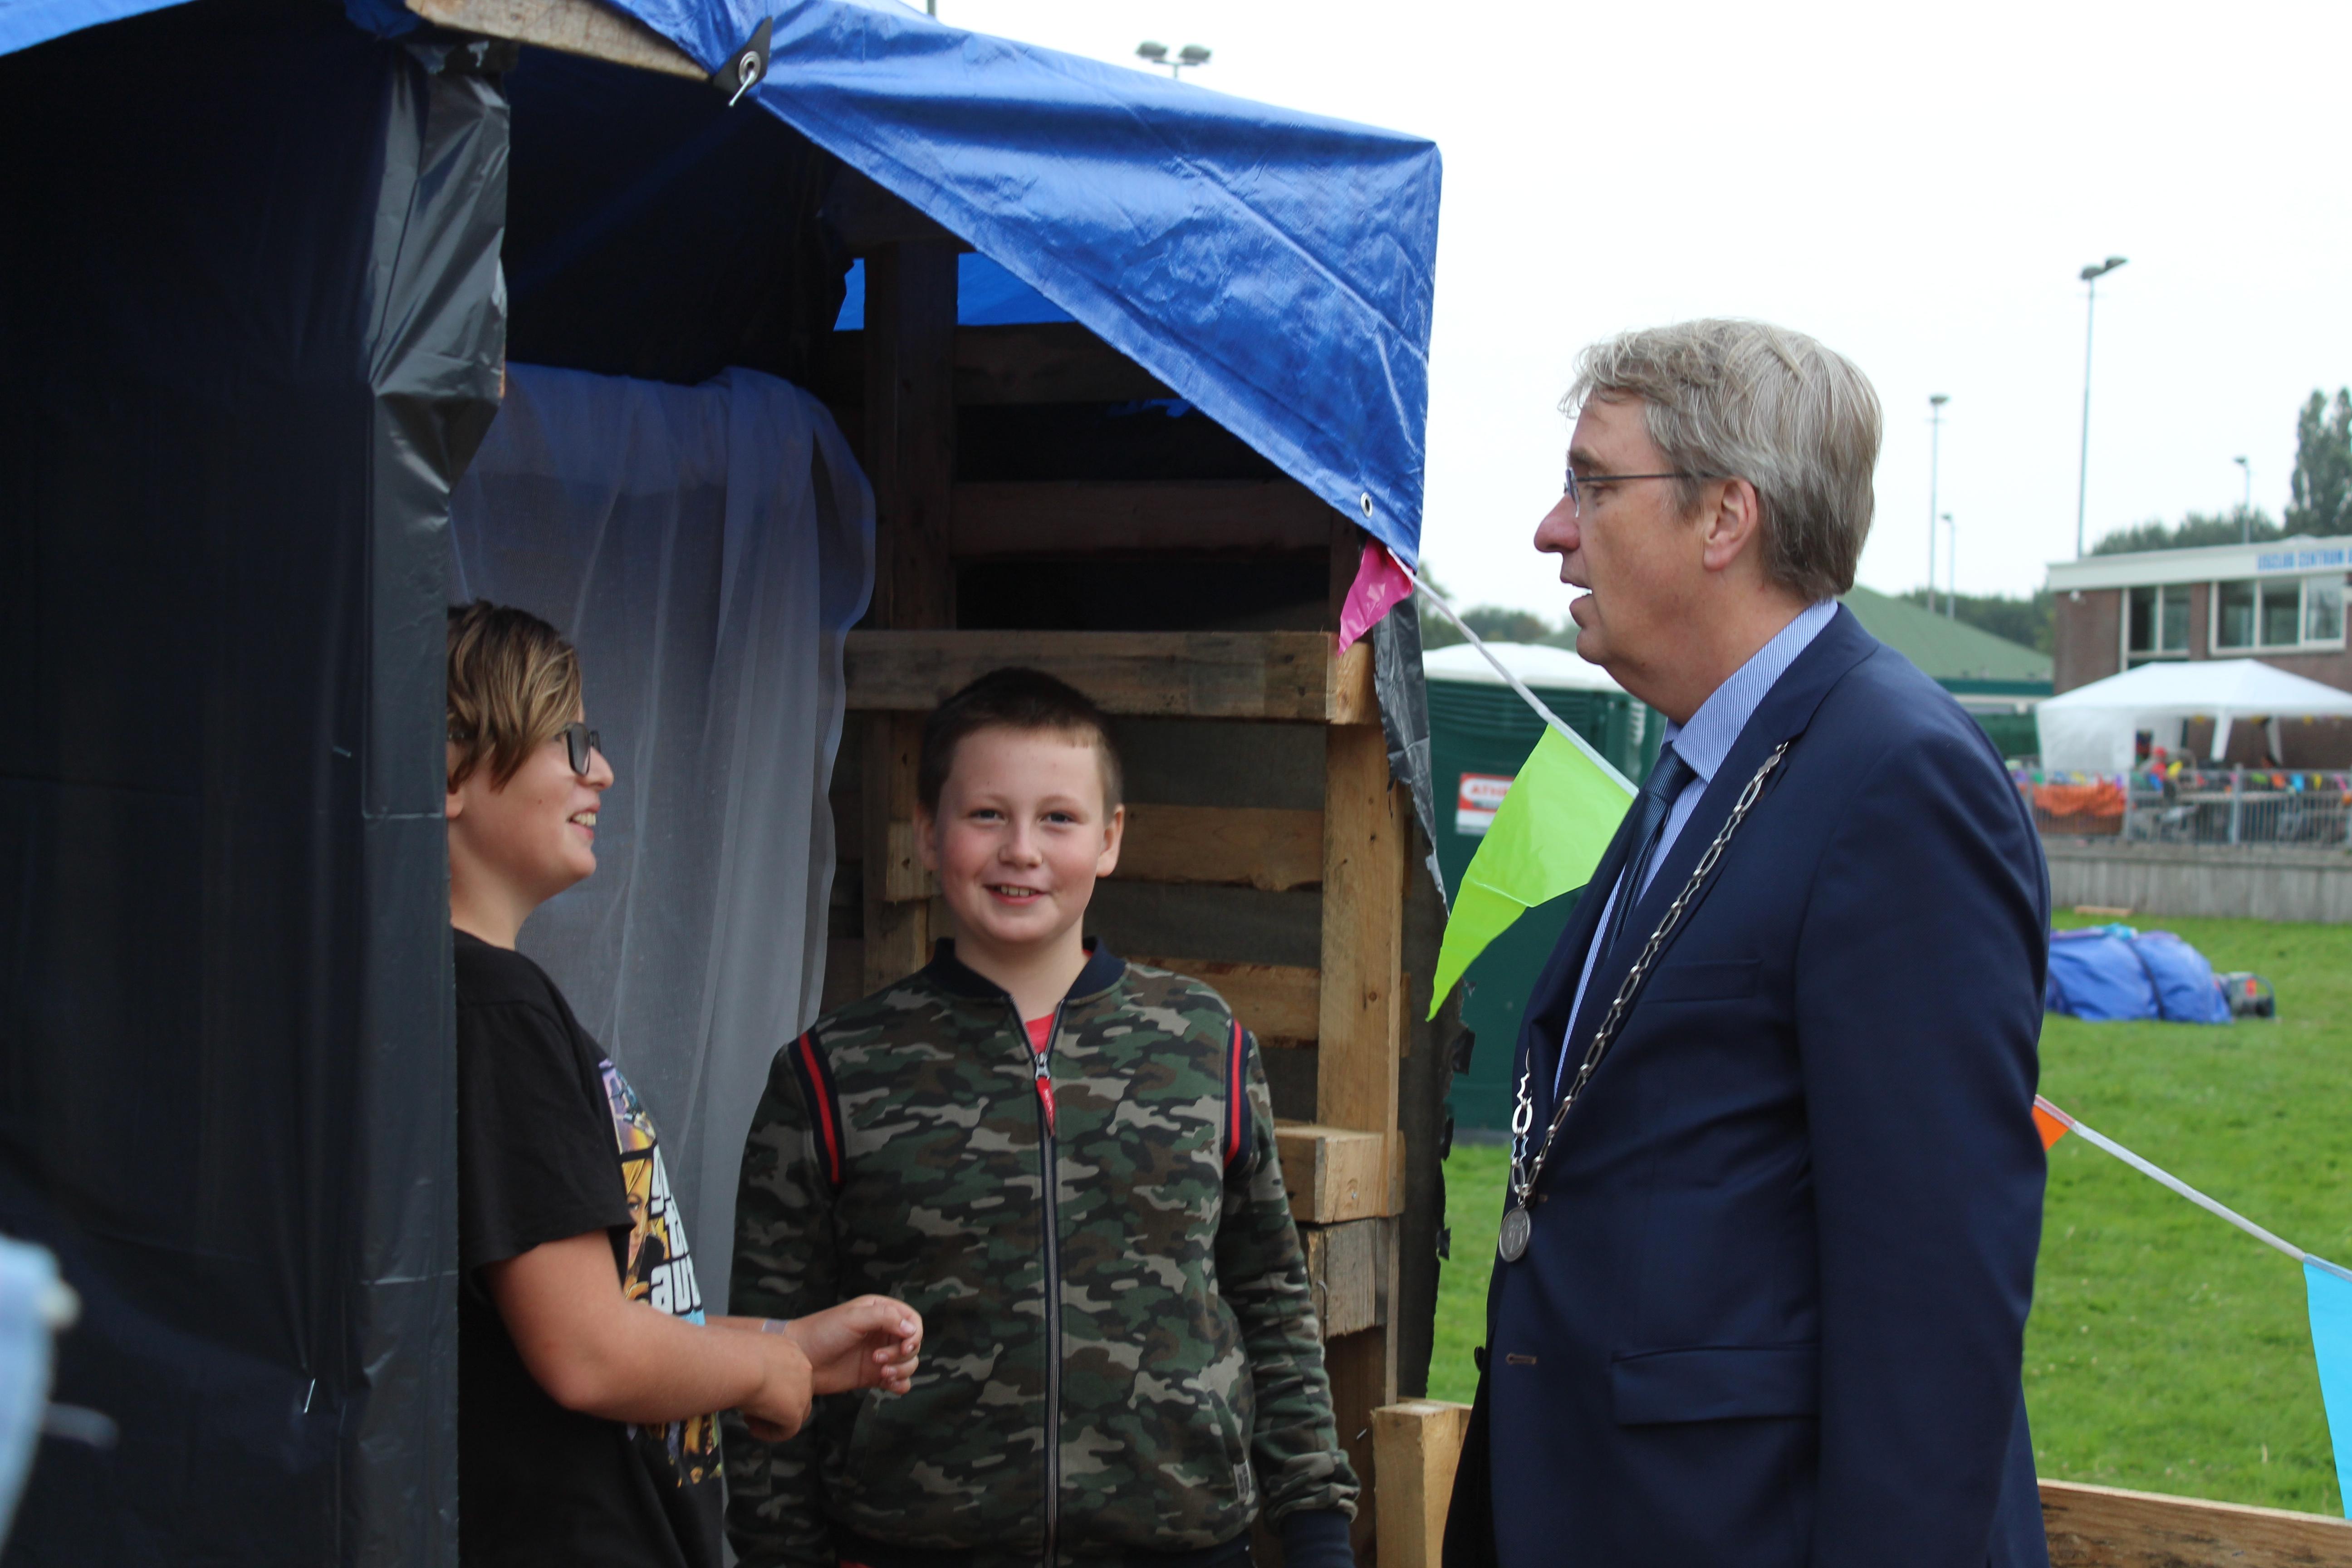 Rob (met keten) en Rob, de twee burgemeesters van het Huttendorp. (Foto's: JWvD)  rodi.nl © rodi